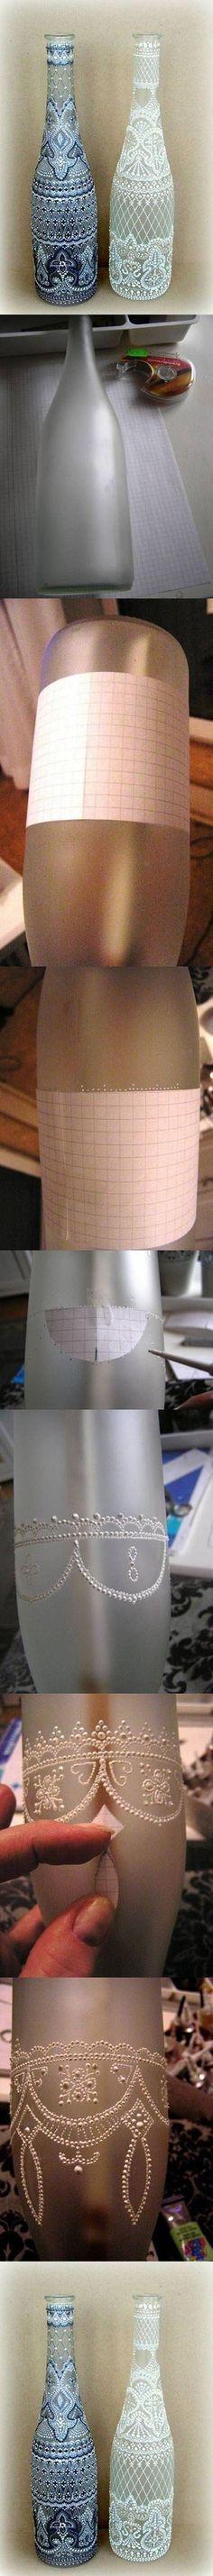 Técnica puntillismo